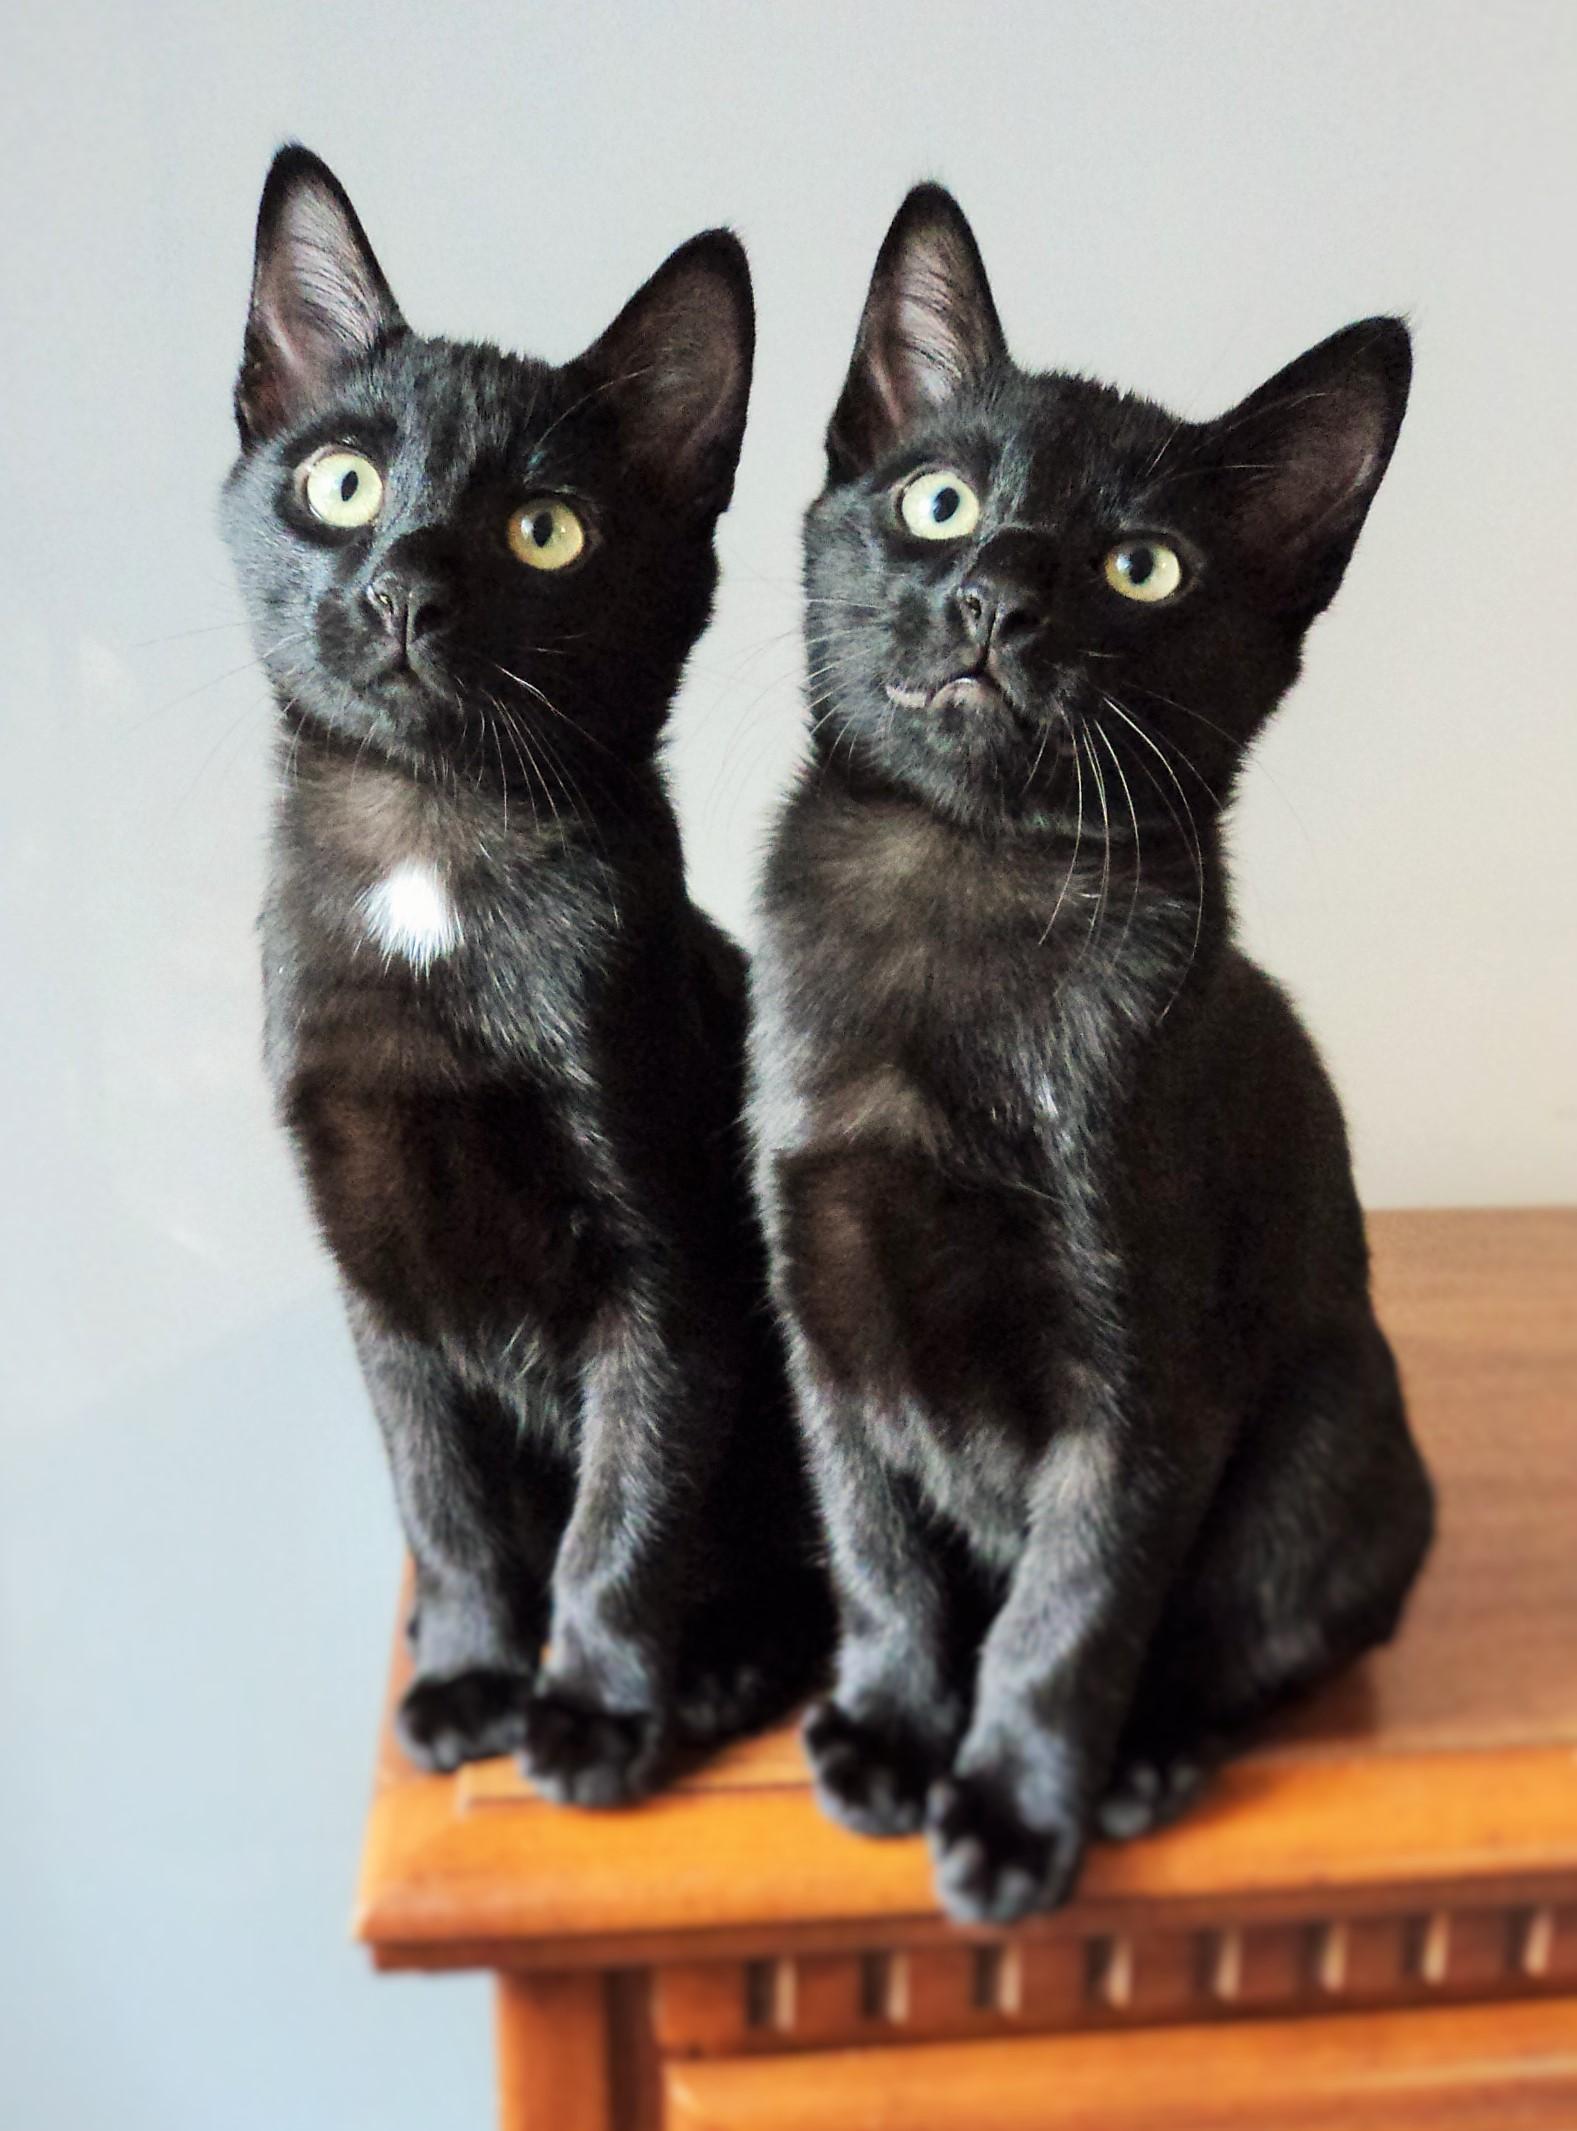 Suphalak Cat: Suphalak Kittenssale Breed